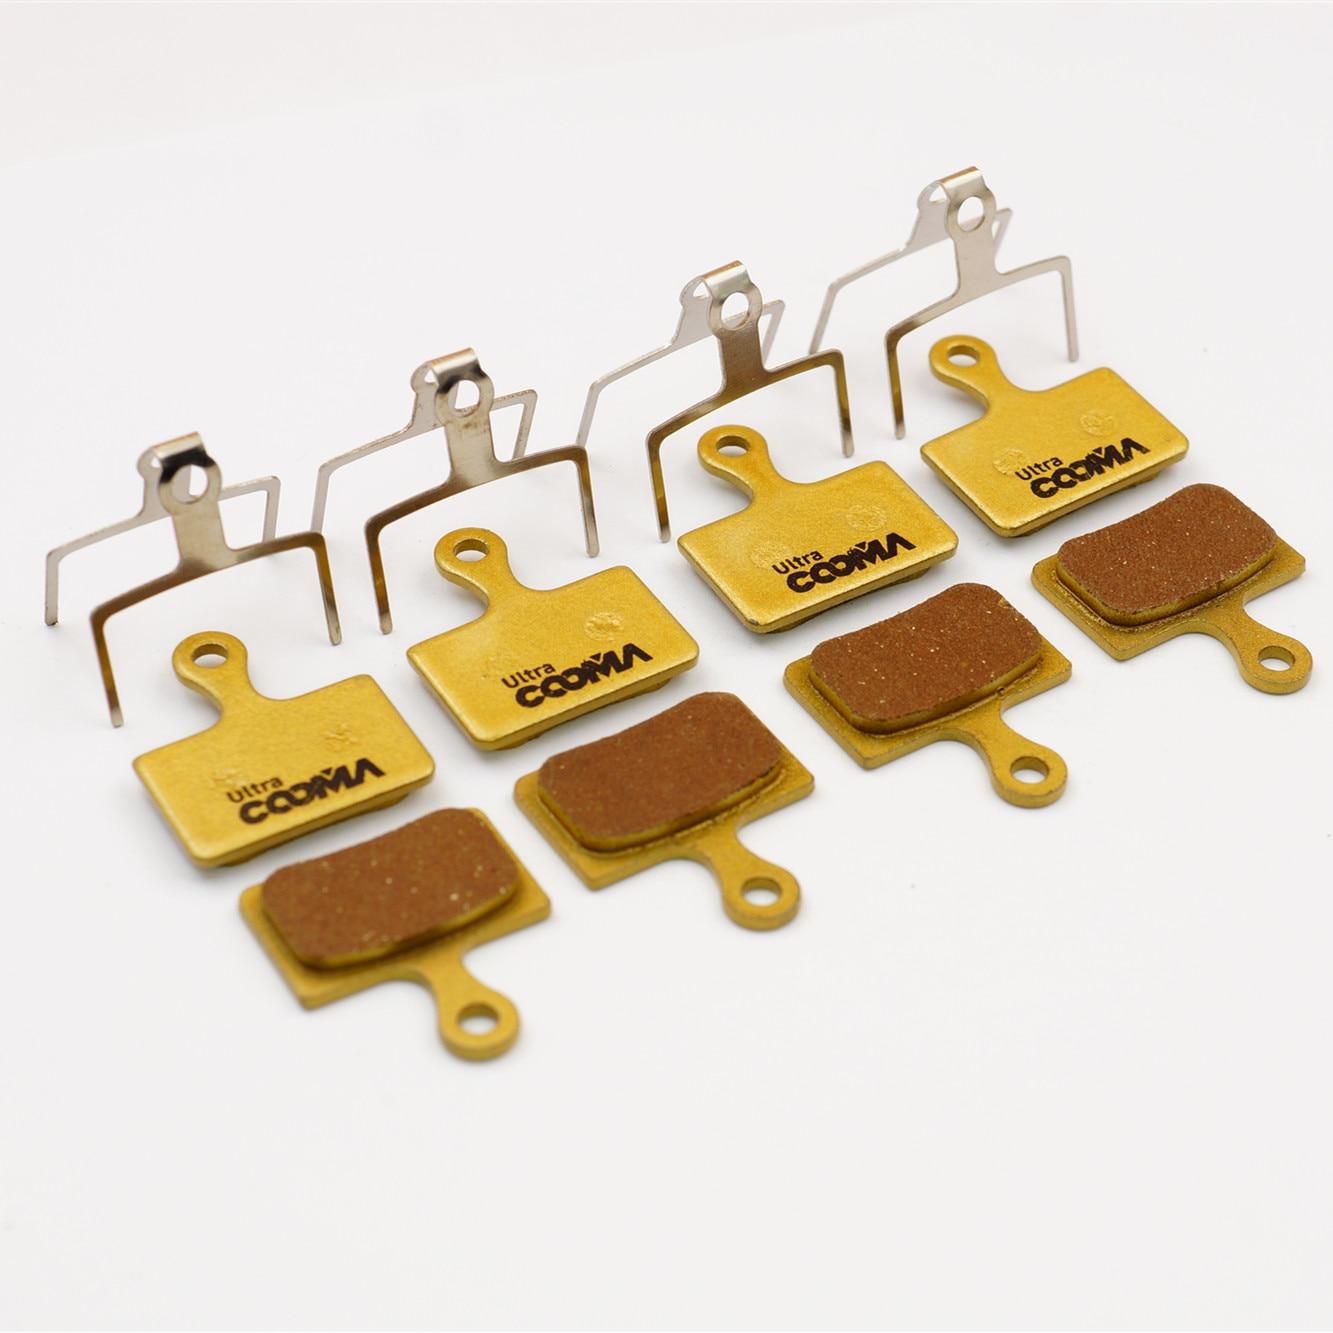 Bicycle Disc Brake Pads for SHIMANO R9170, M9100, Ultegra R8070, RS805, RS505, RS405 Disc Brake, 4 Pairs, Gold Full Metal